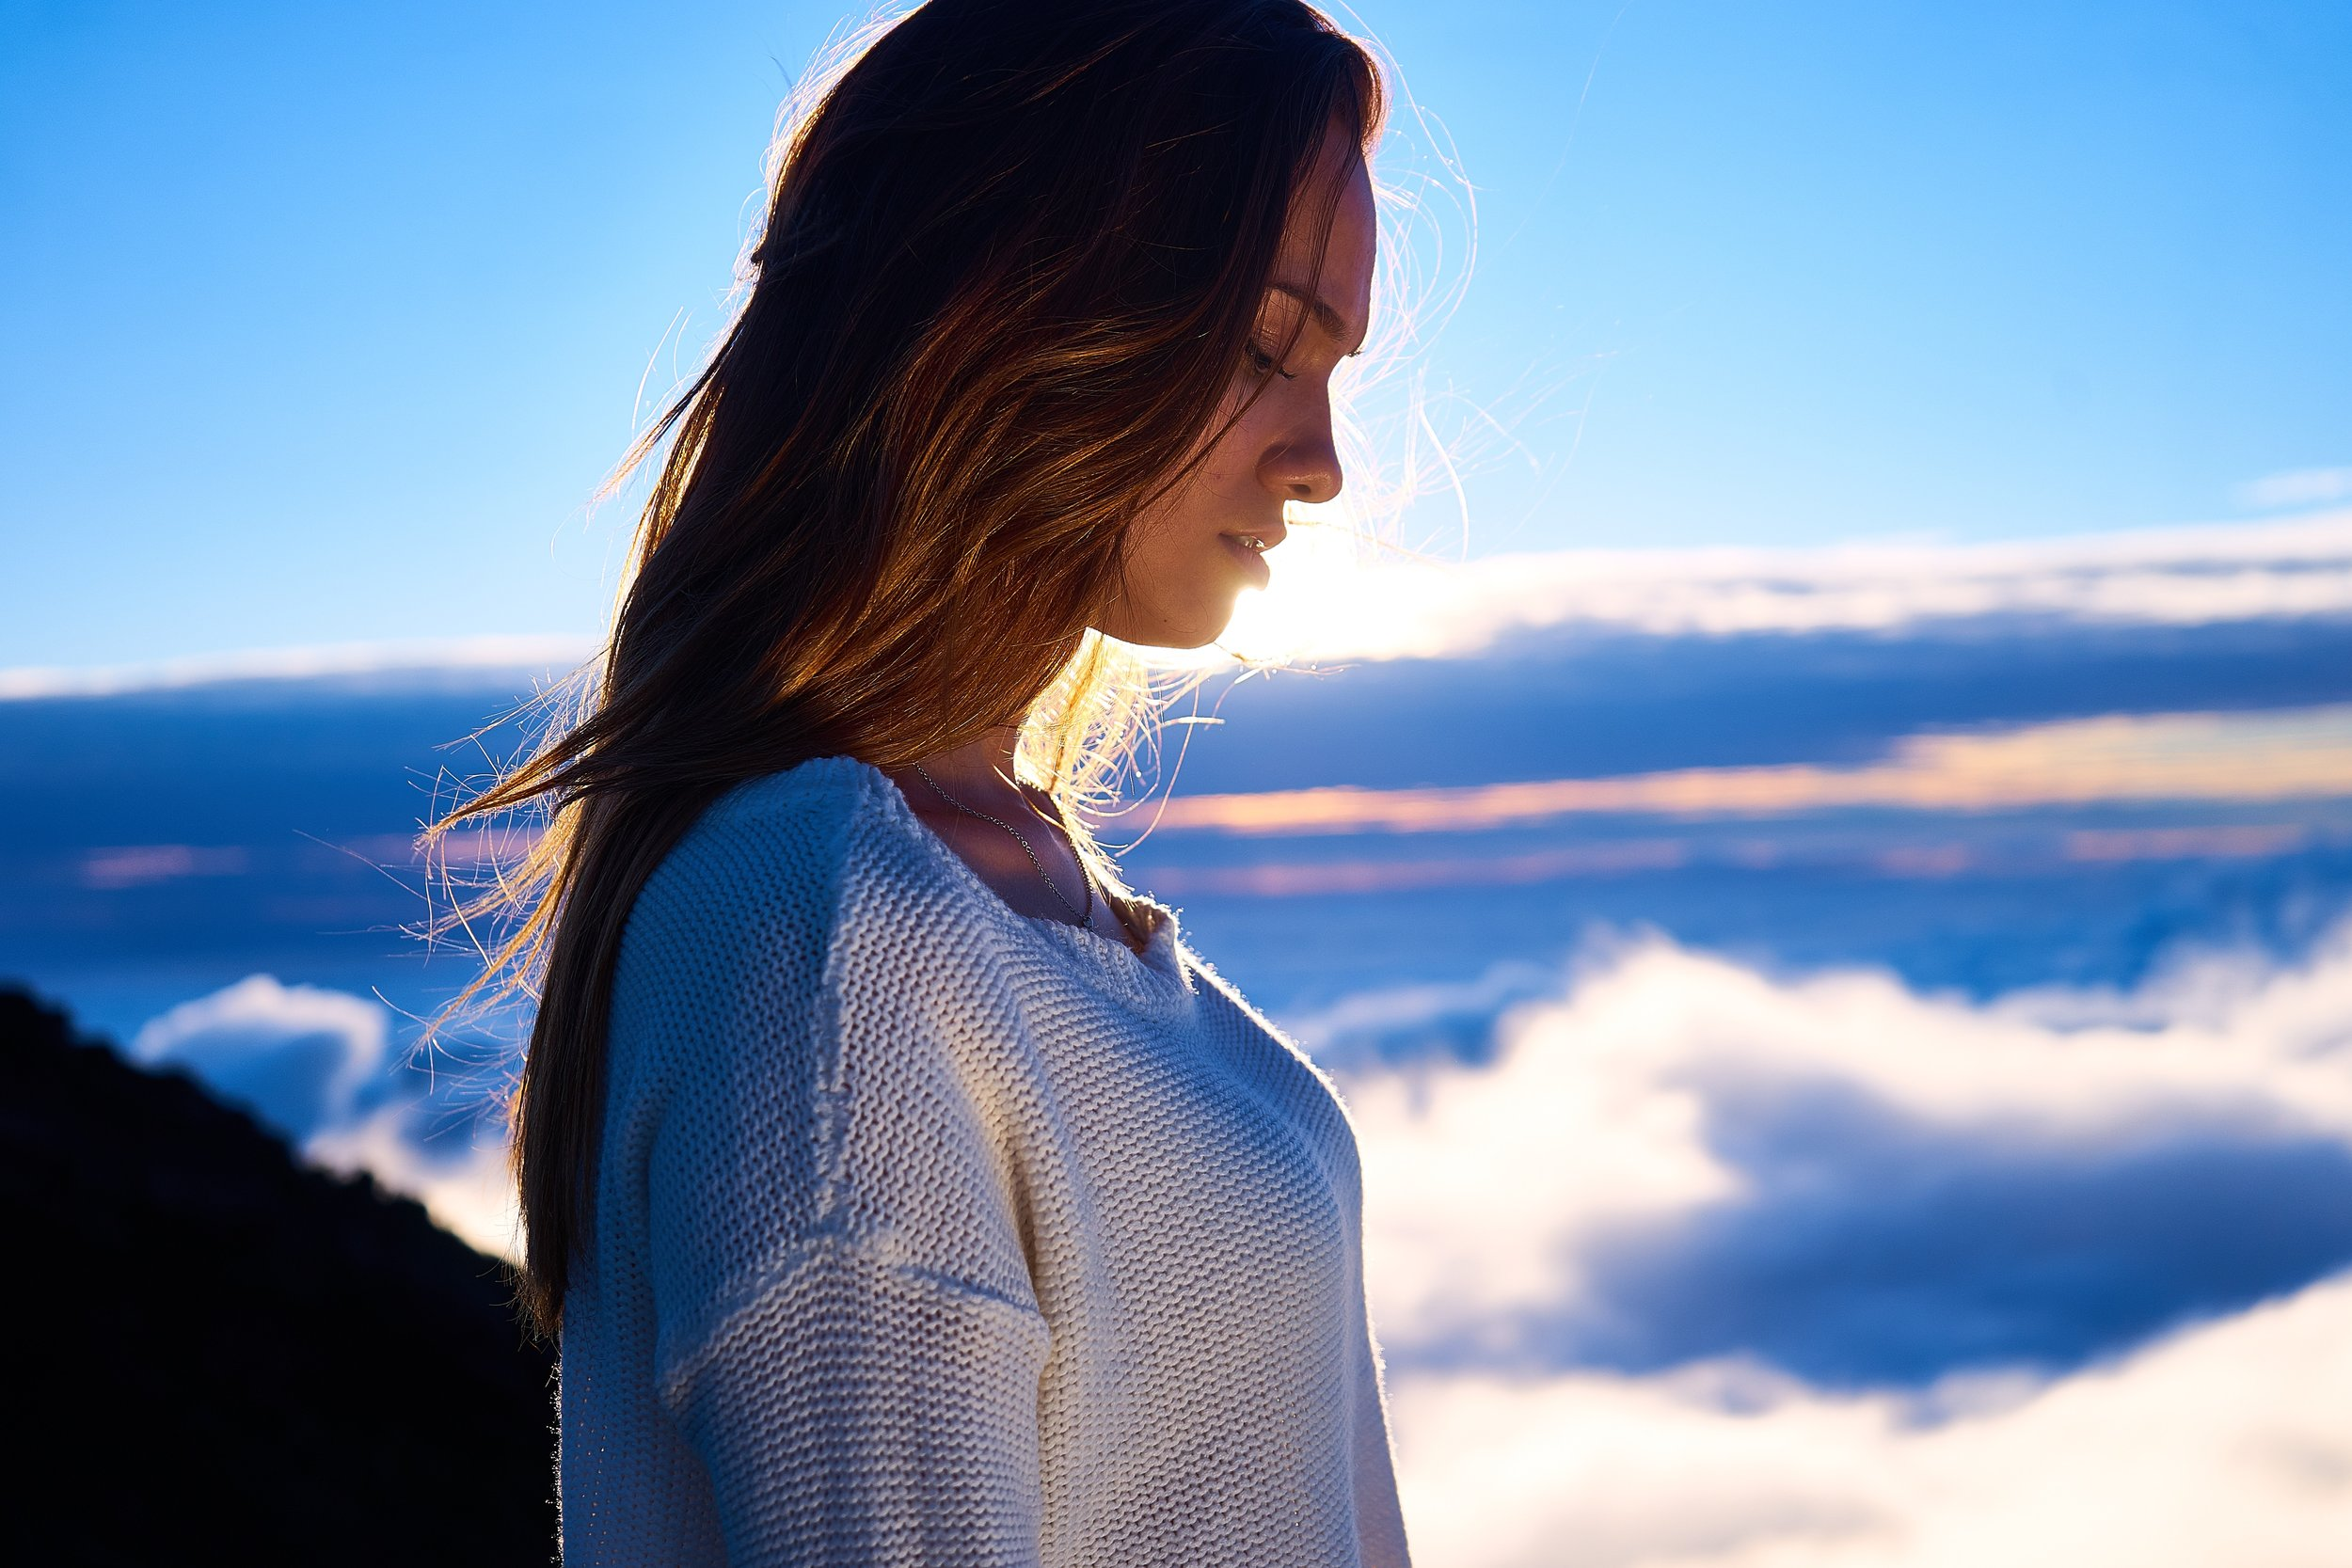 woman looking down at sunset -unsplash.jpg